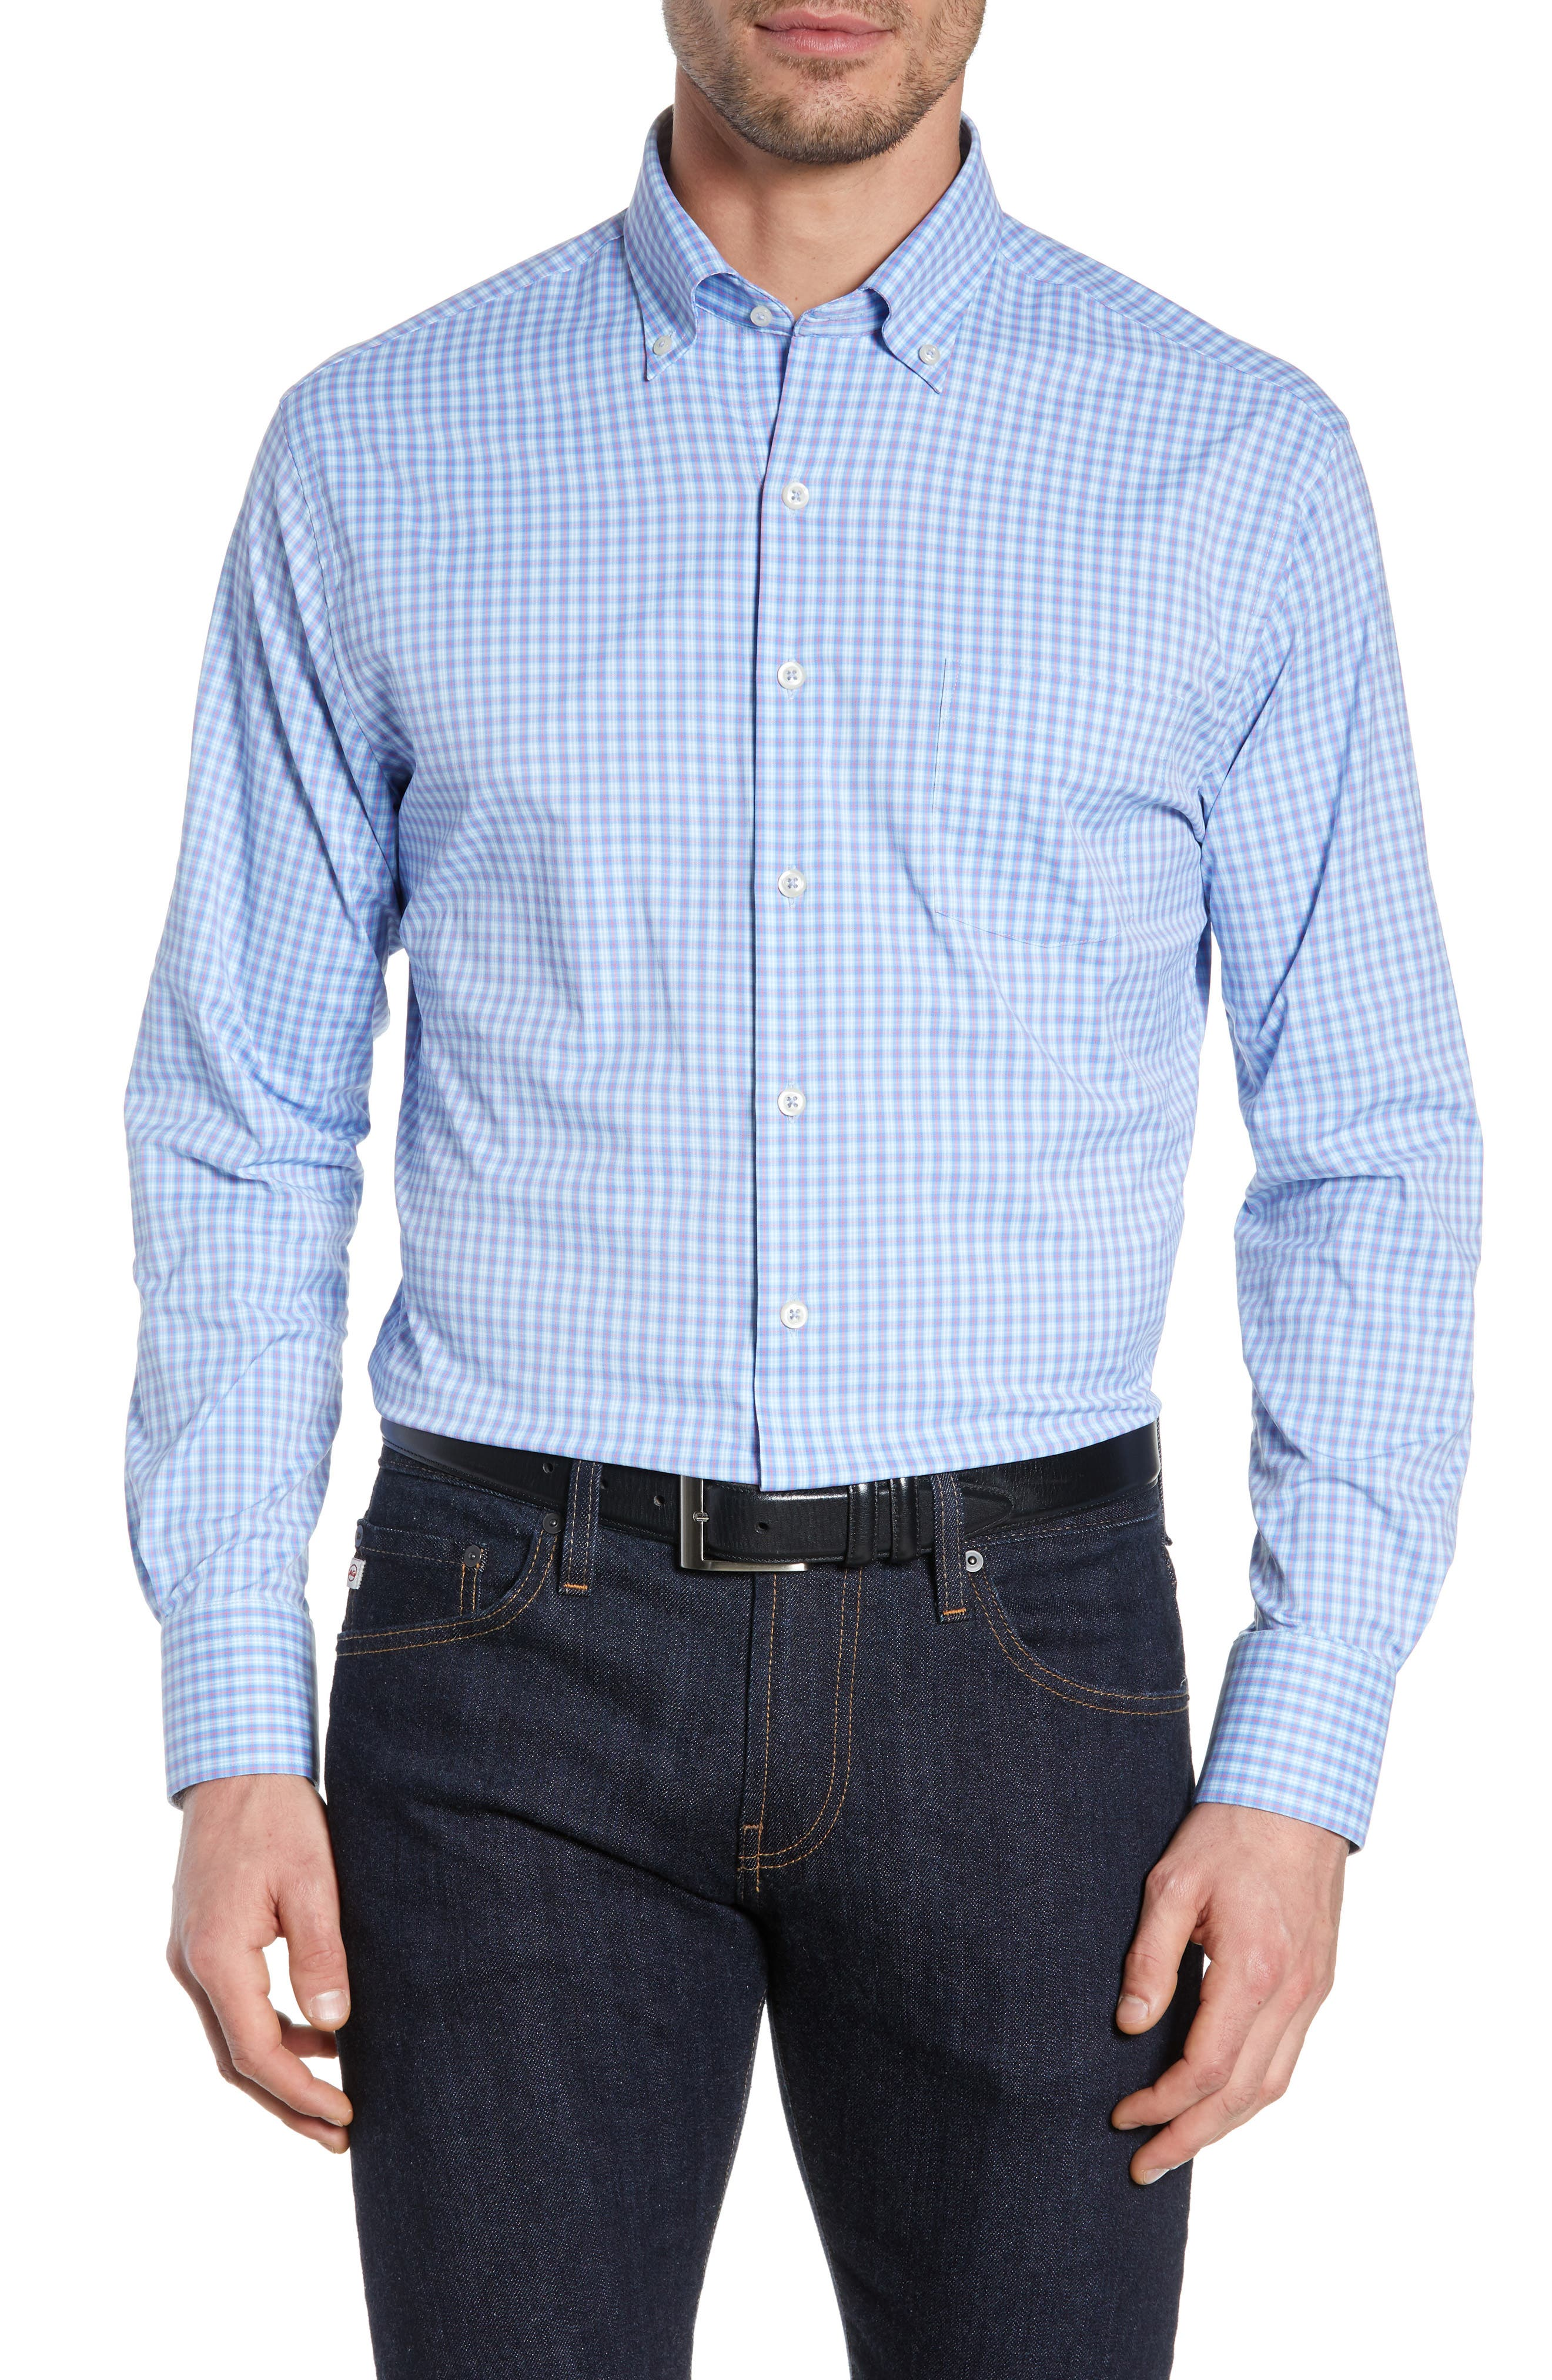 PETER MILLAR, Hawkins Plaid Performance Sport Shirt, Main thumbnail 1, color, VESSEL